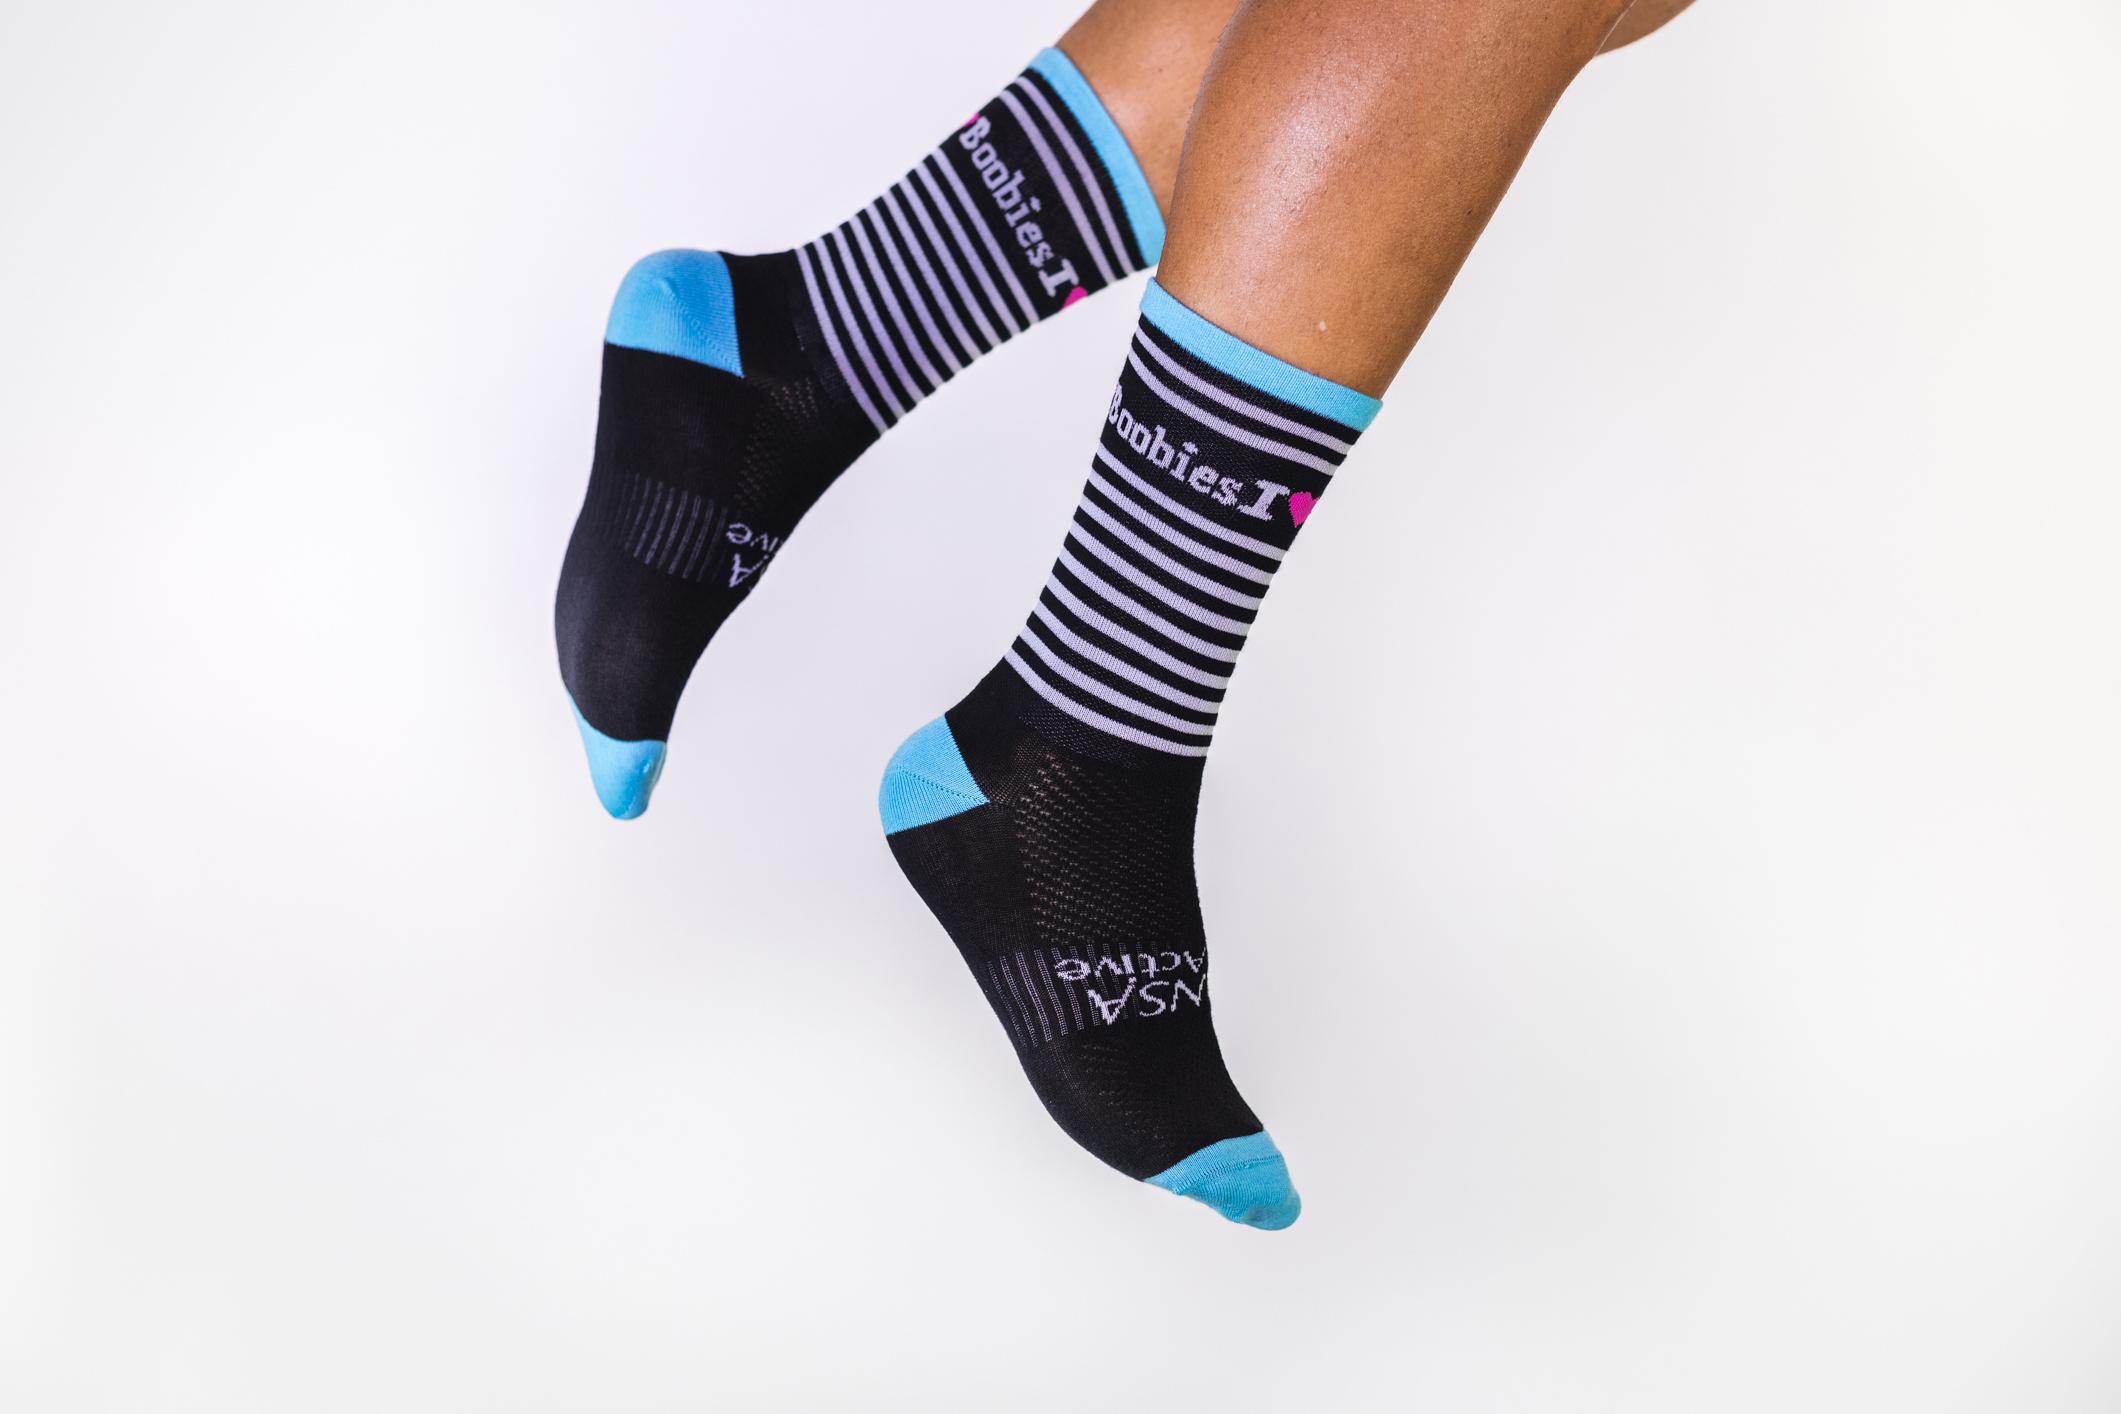 Black & White Striped Socks P006